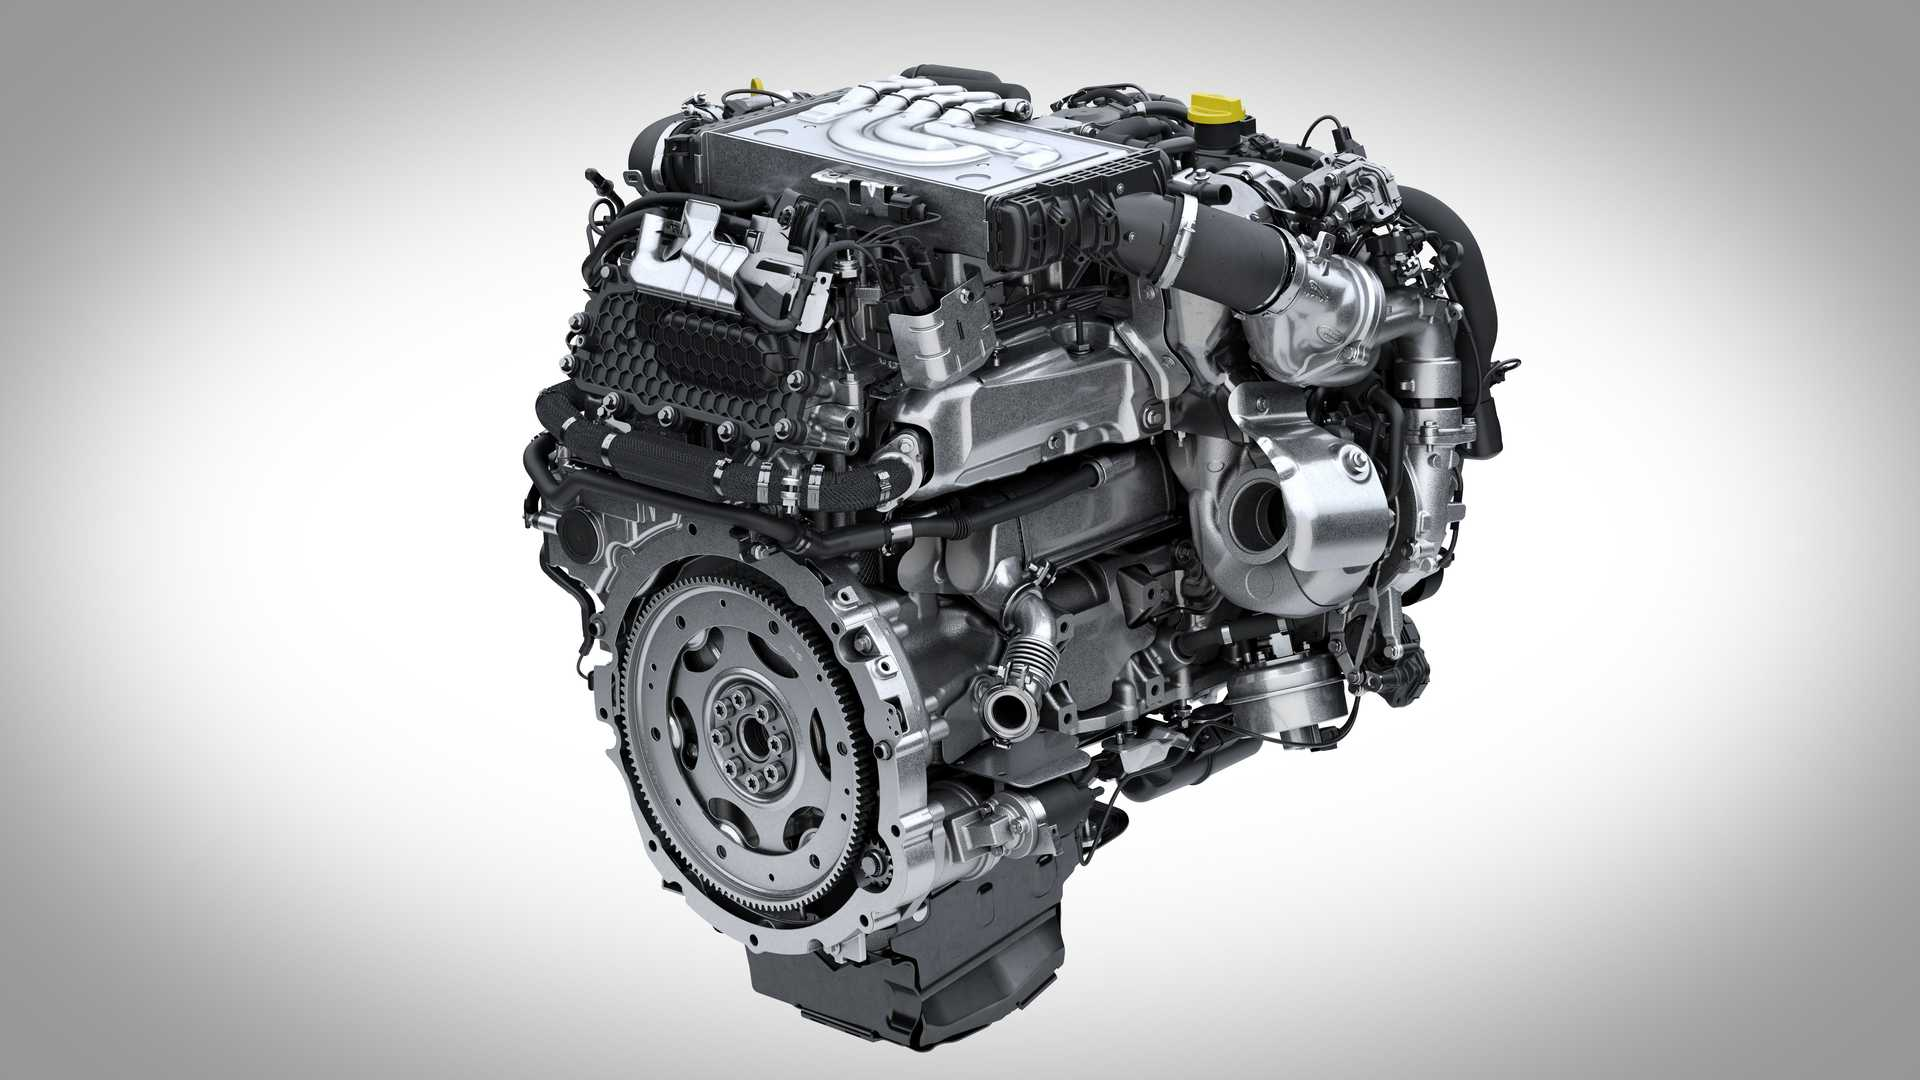 https://cdn.motor1.com/images/mgl/KLl3N/s6/i-motori-ingenium-di-jaguar-land-rover.jpg